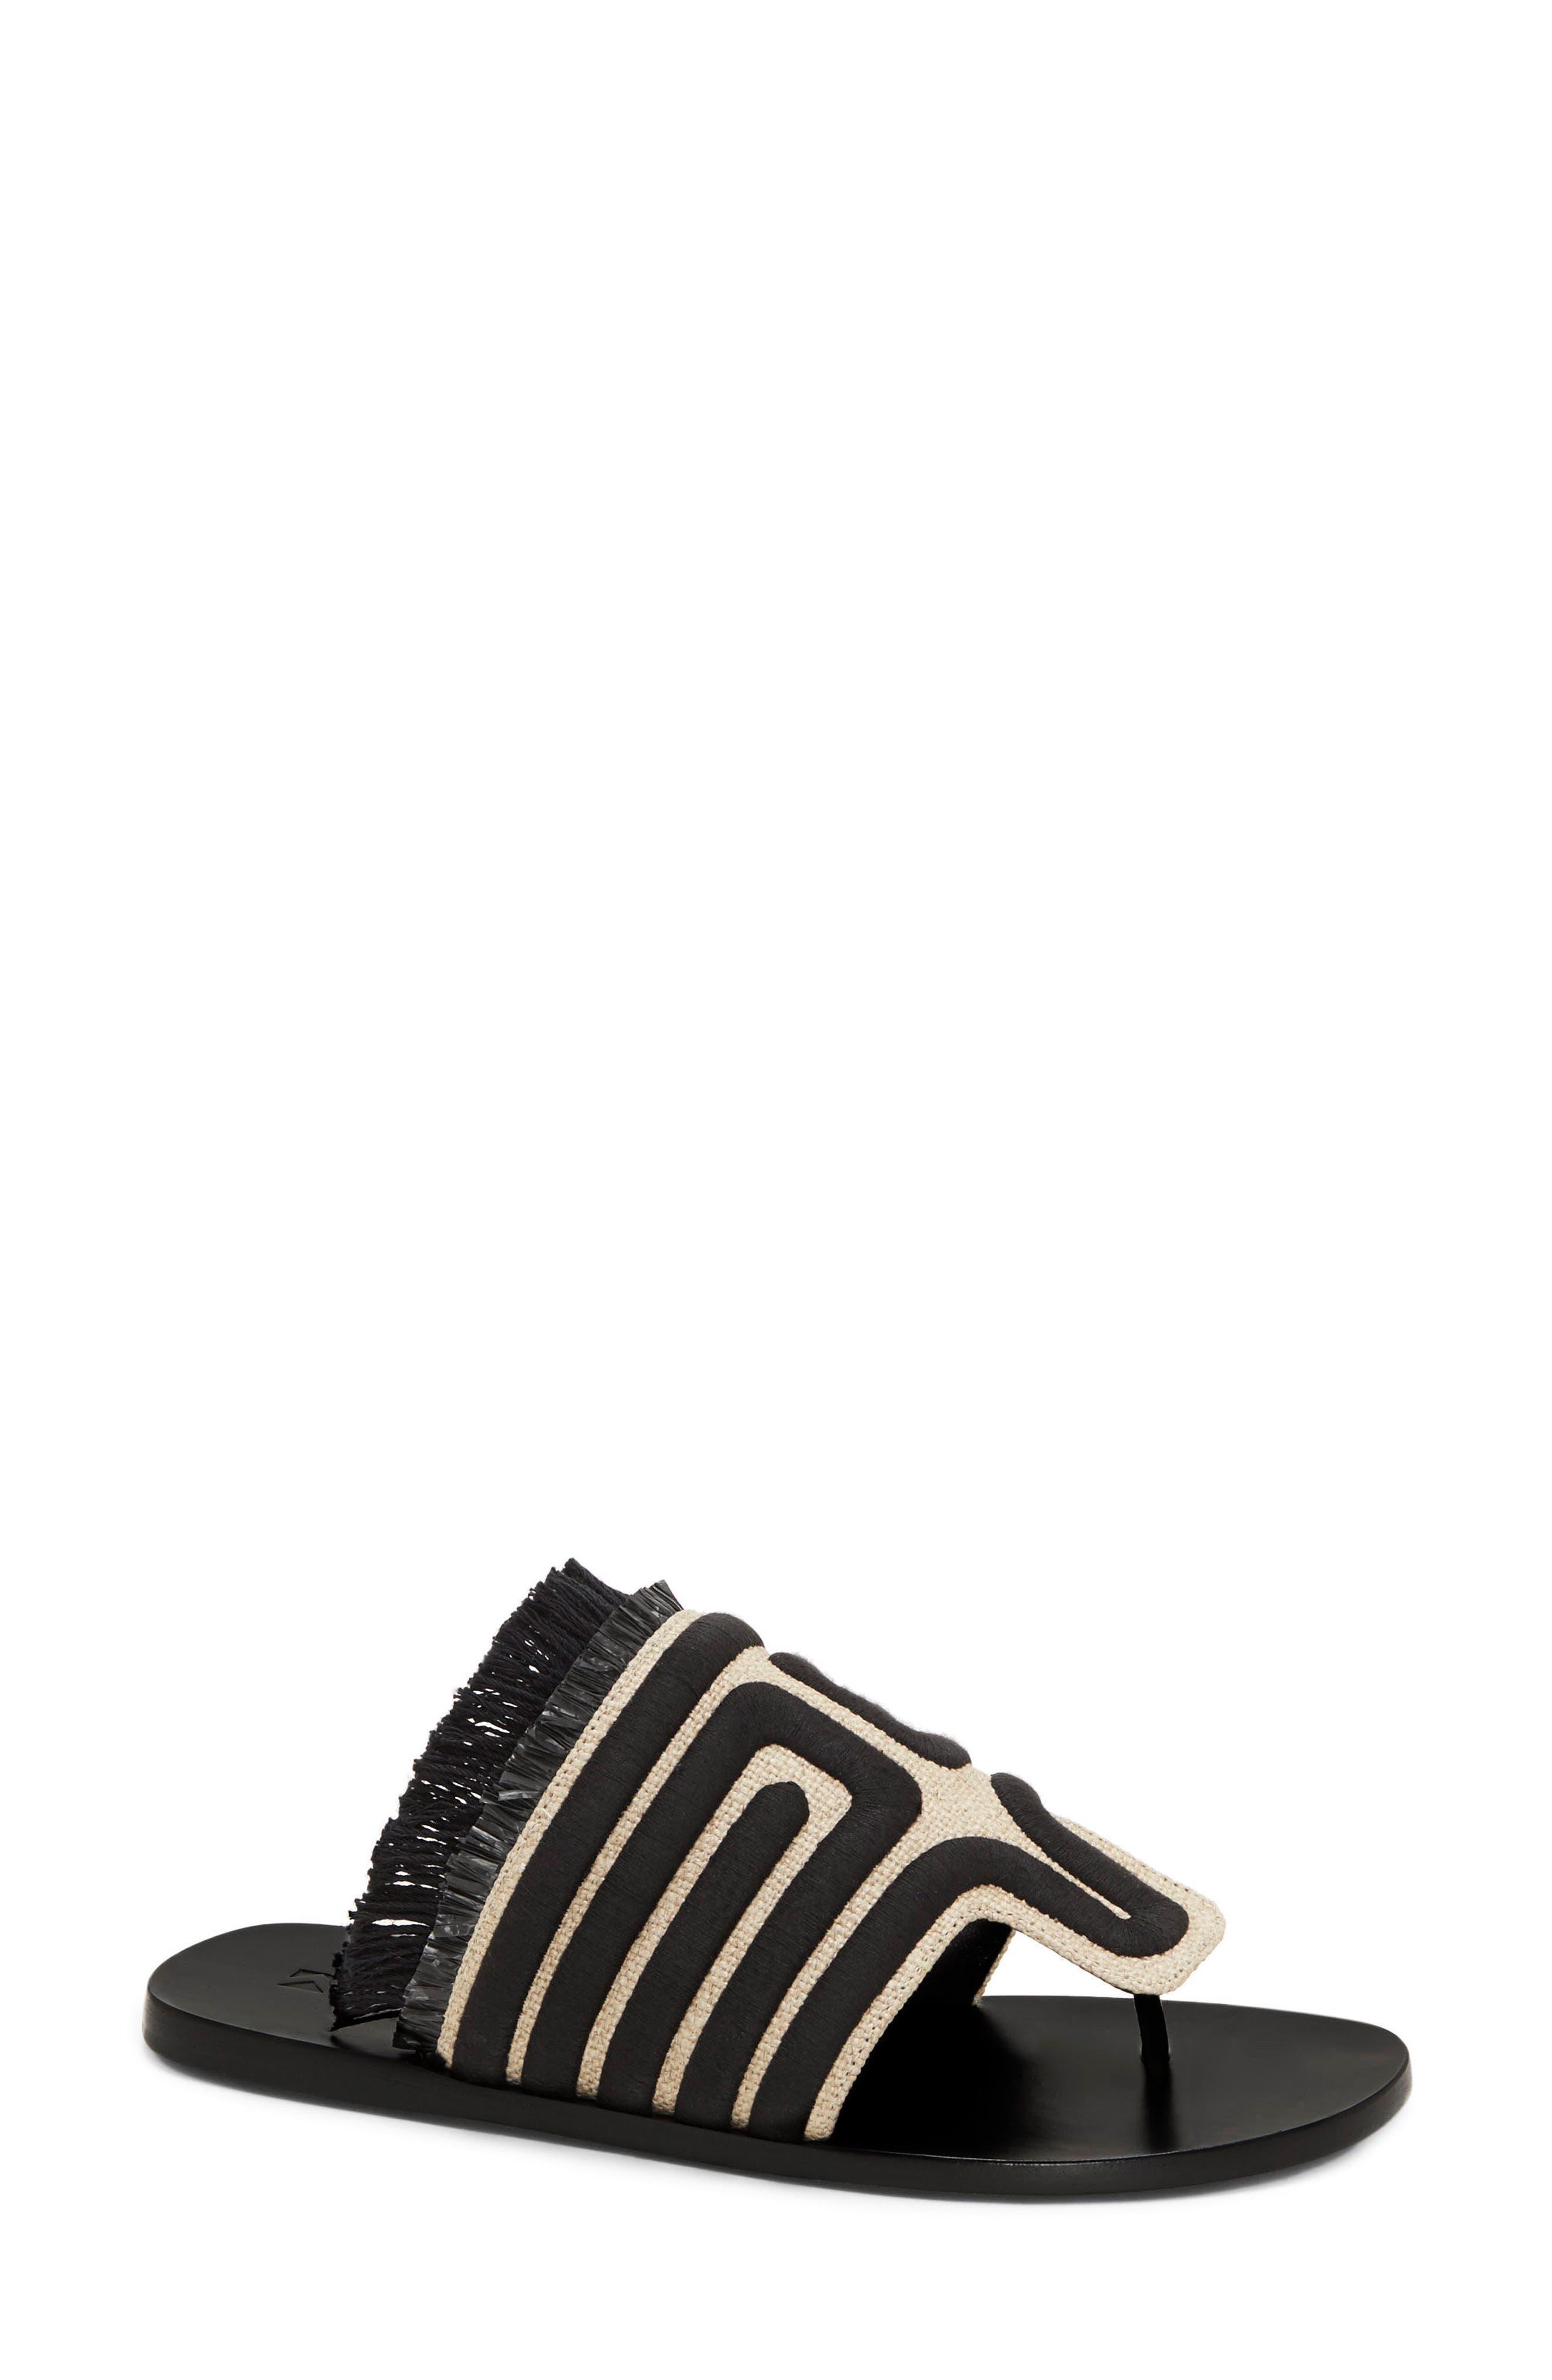 Lucara Embroidered Sandal,                             Main thumbnail 1, color,